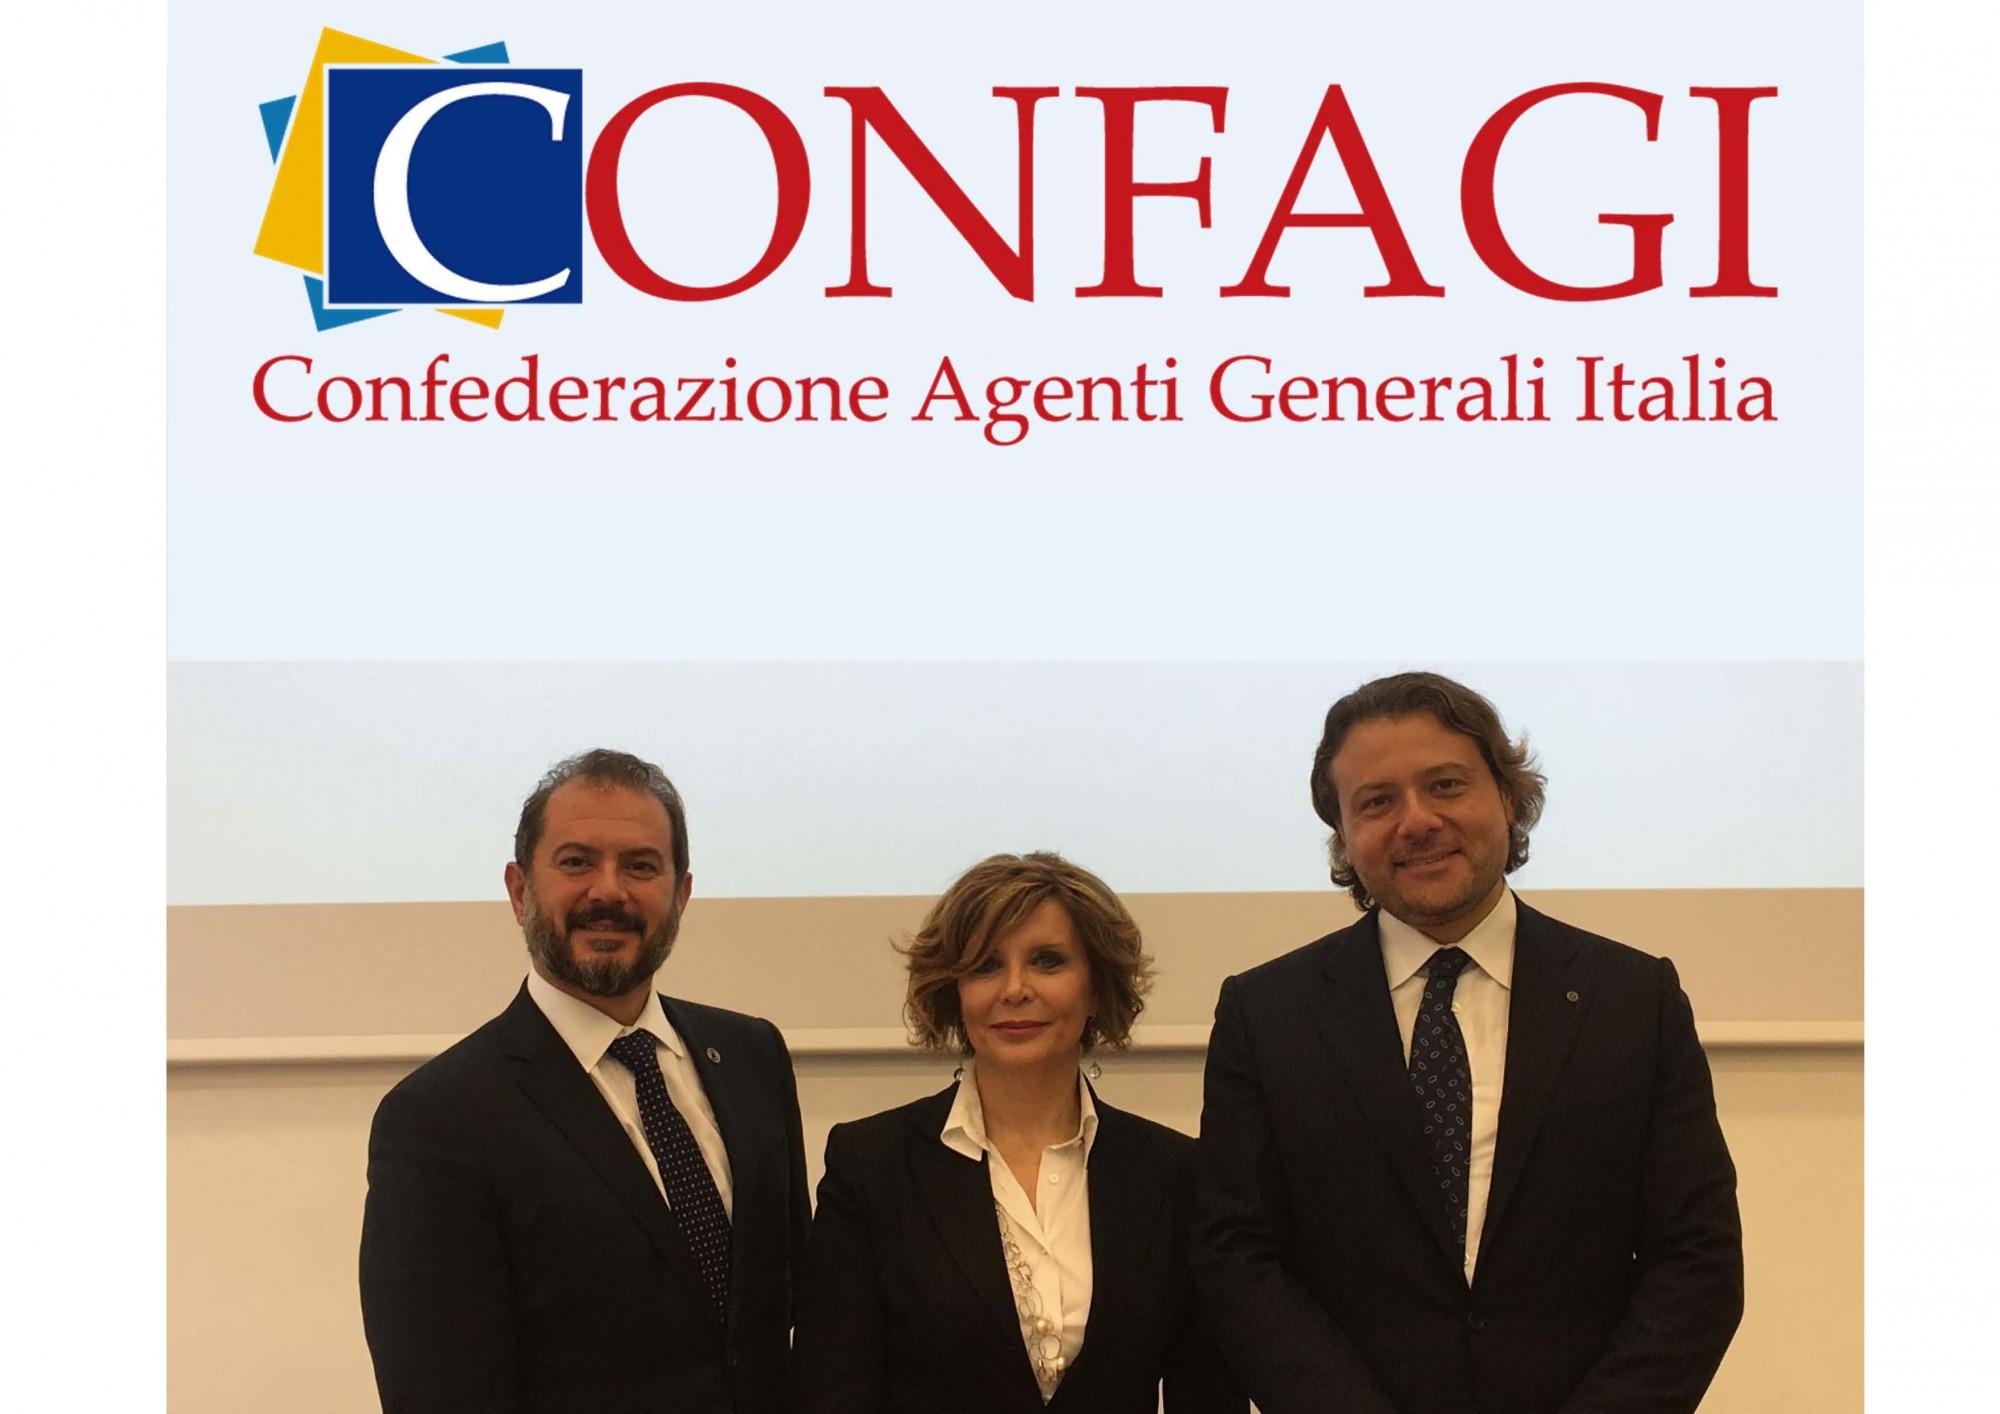 CONFAGI - Canu - Musto - Nicolao Imc